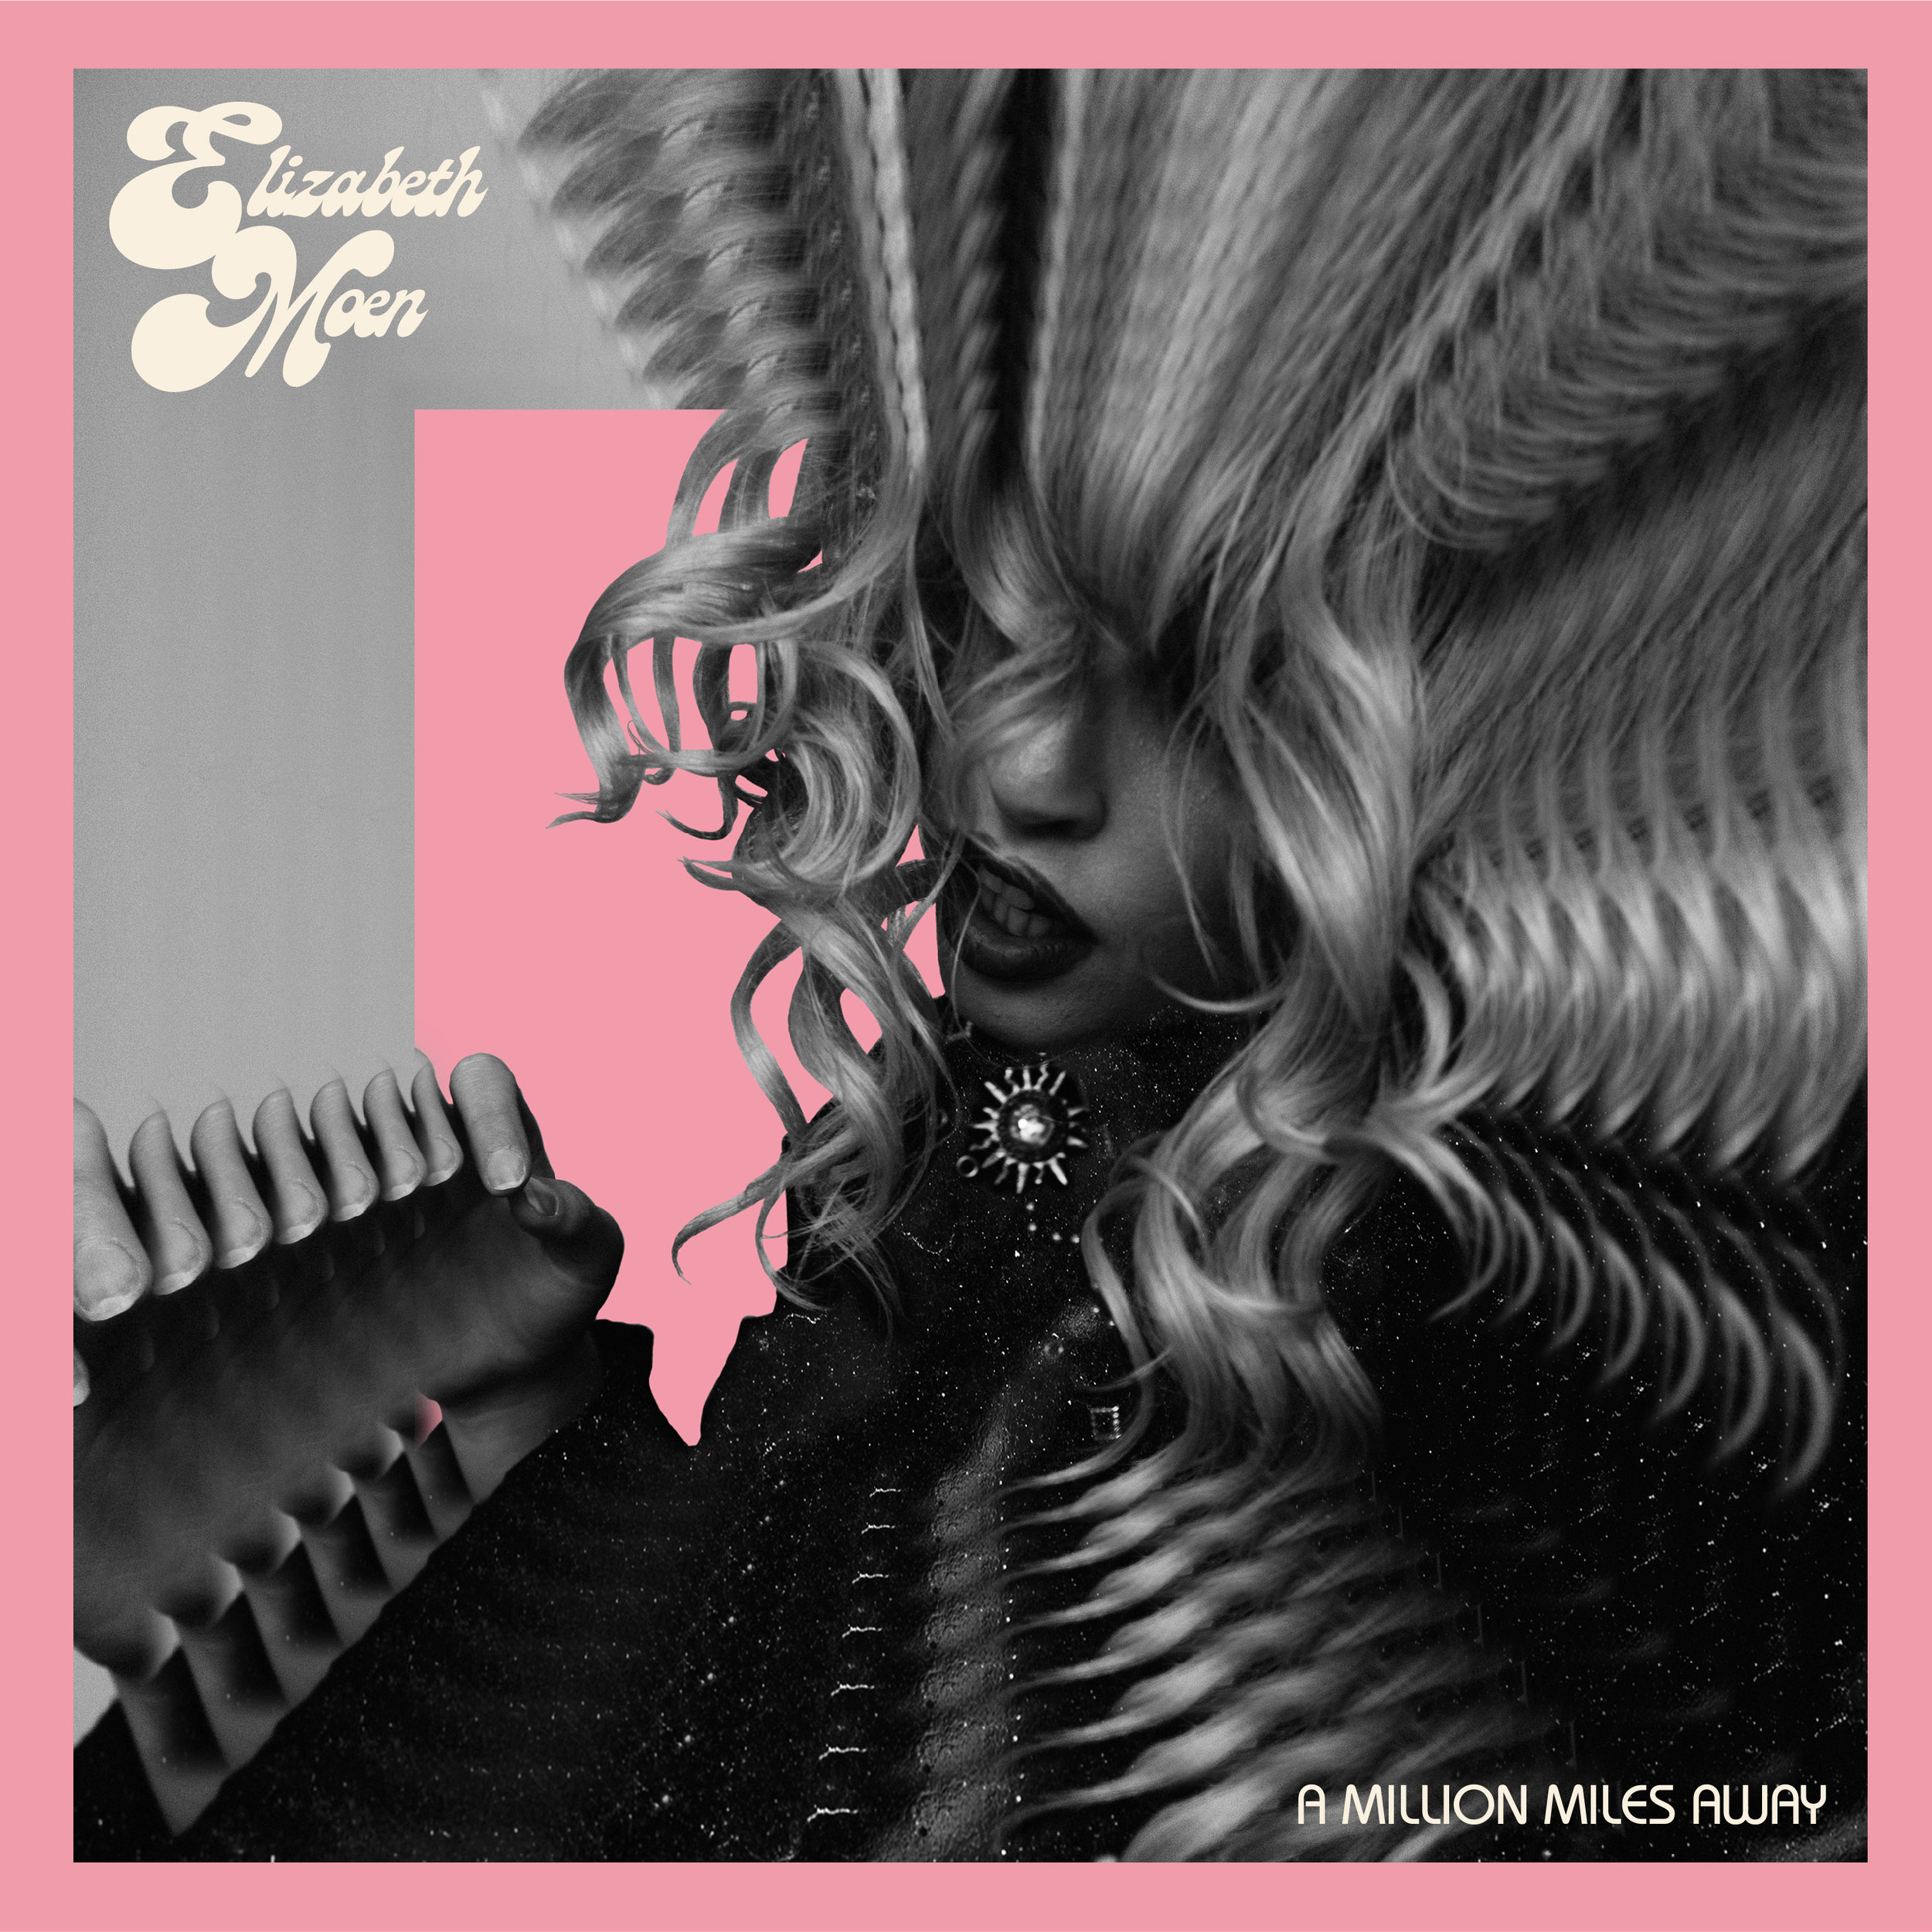 20180805_elizabeth-moen_album-cover (front-small)_1.jpg